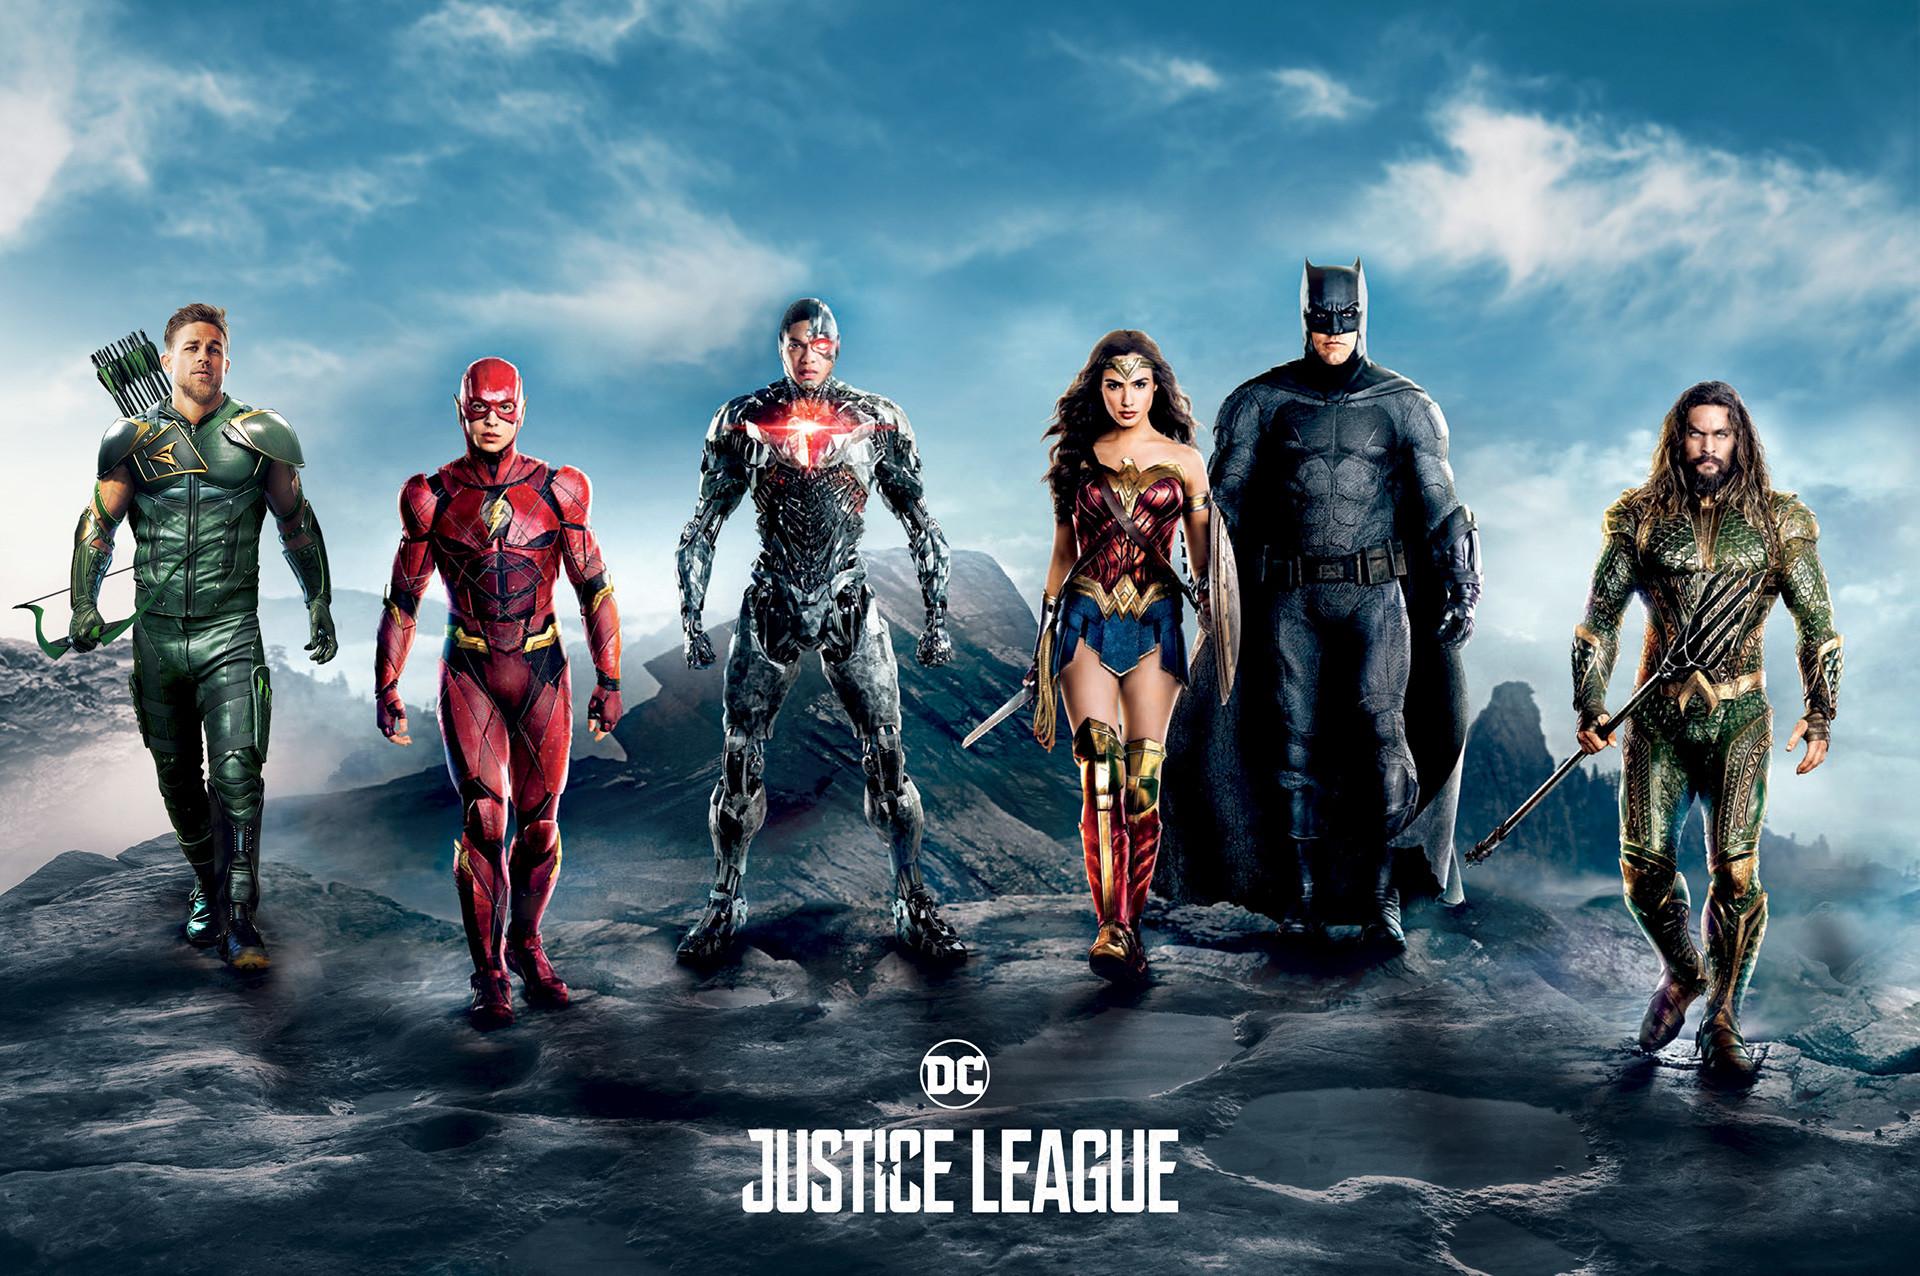 Justice League 2017 Movie 4k Hd Desktop Wallpaper For 4k: 1920x1080 2017 Justice League Laptop Full HD 1080P HD 4k